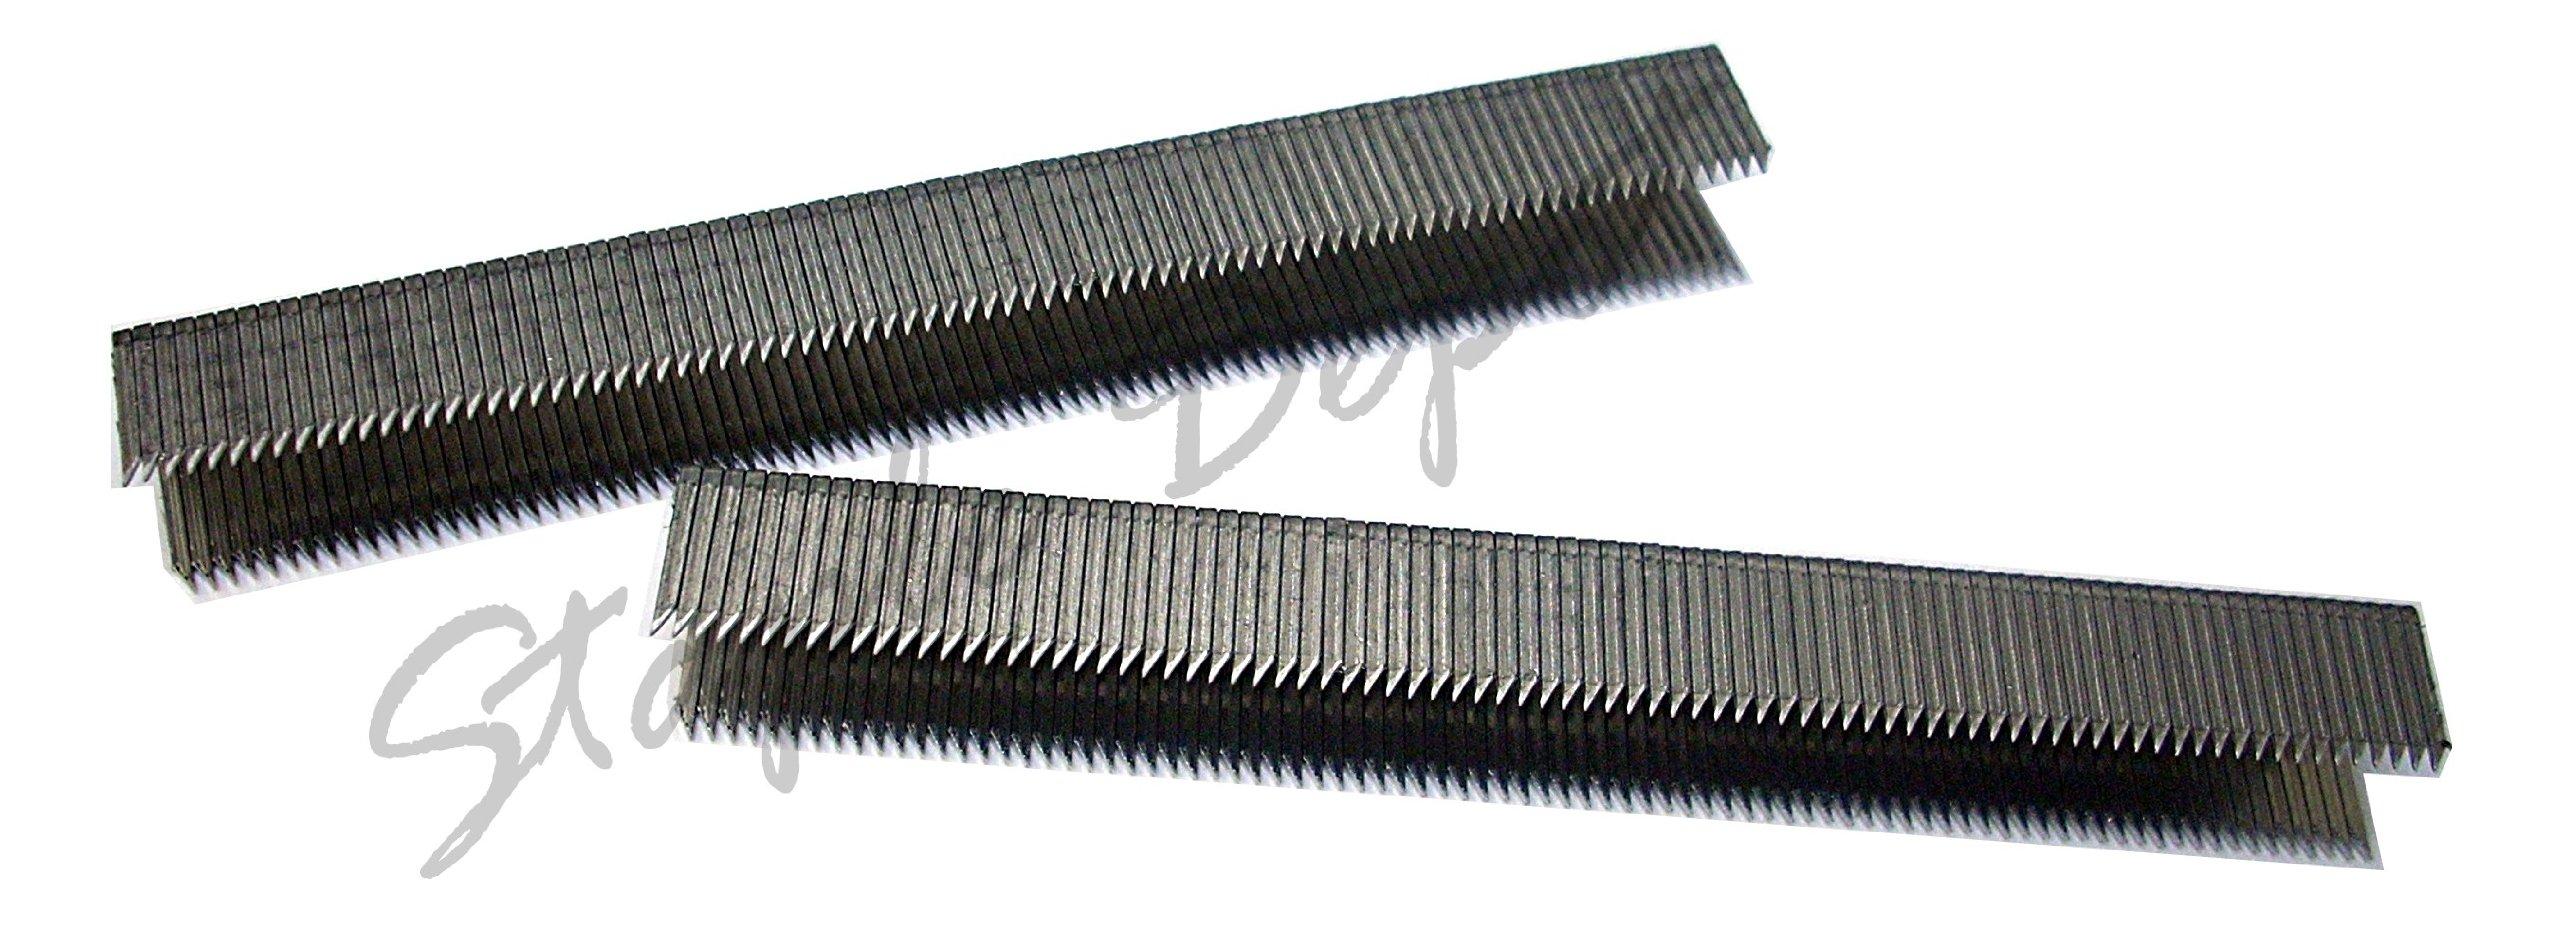 5016D 1/2'' Aluminum Staples for Duofast